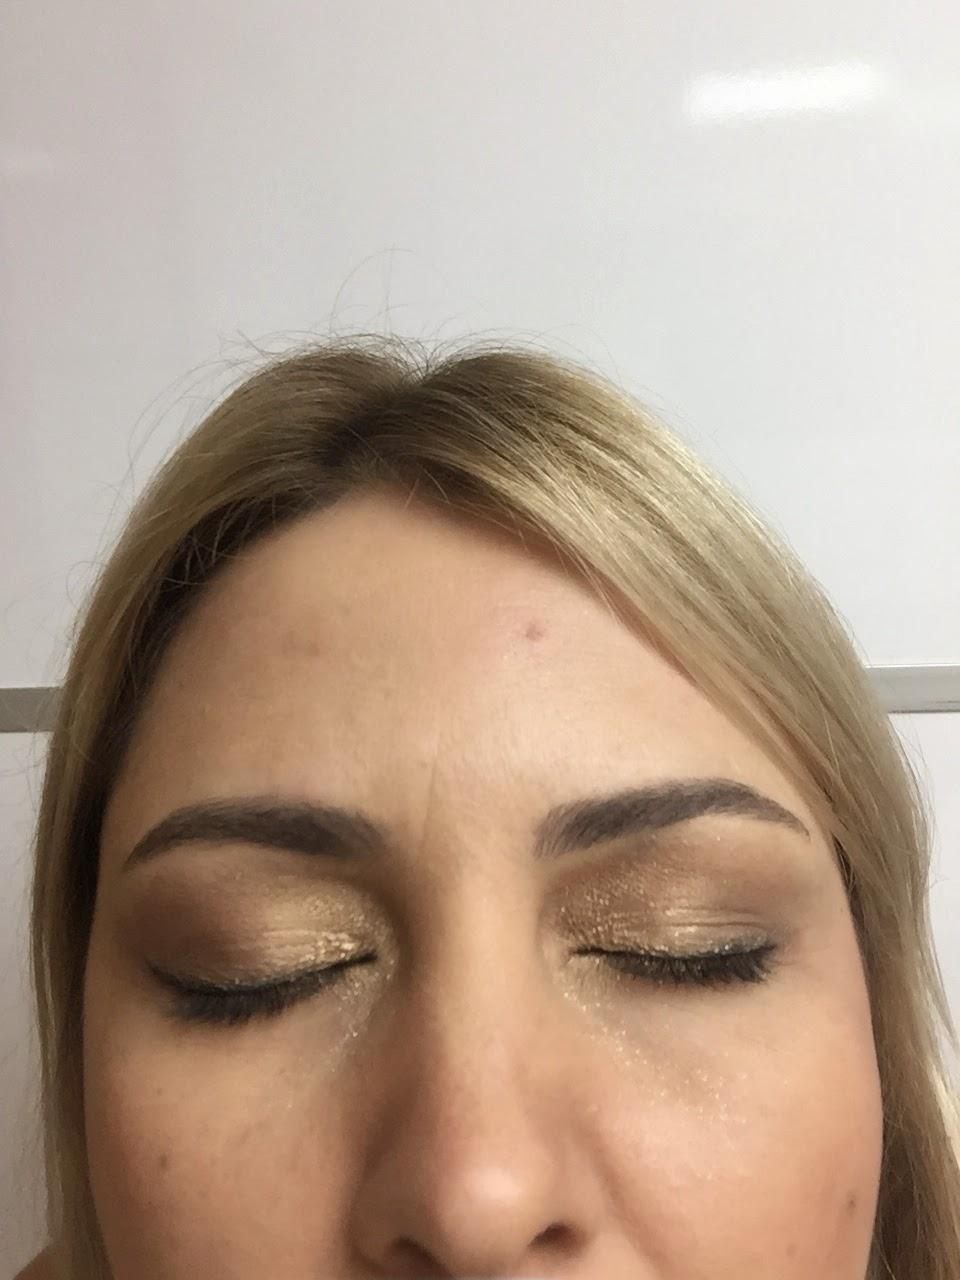 loucasporshampoo makeup ombre sombra dourada trio Baked elke